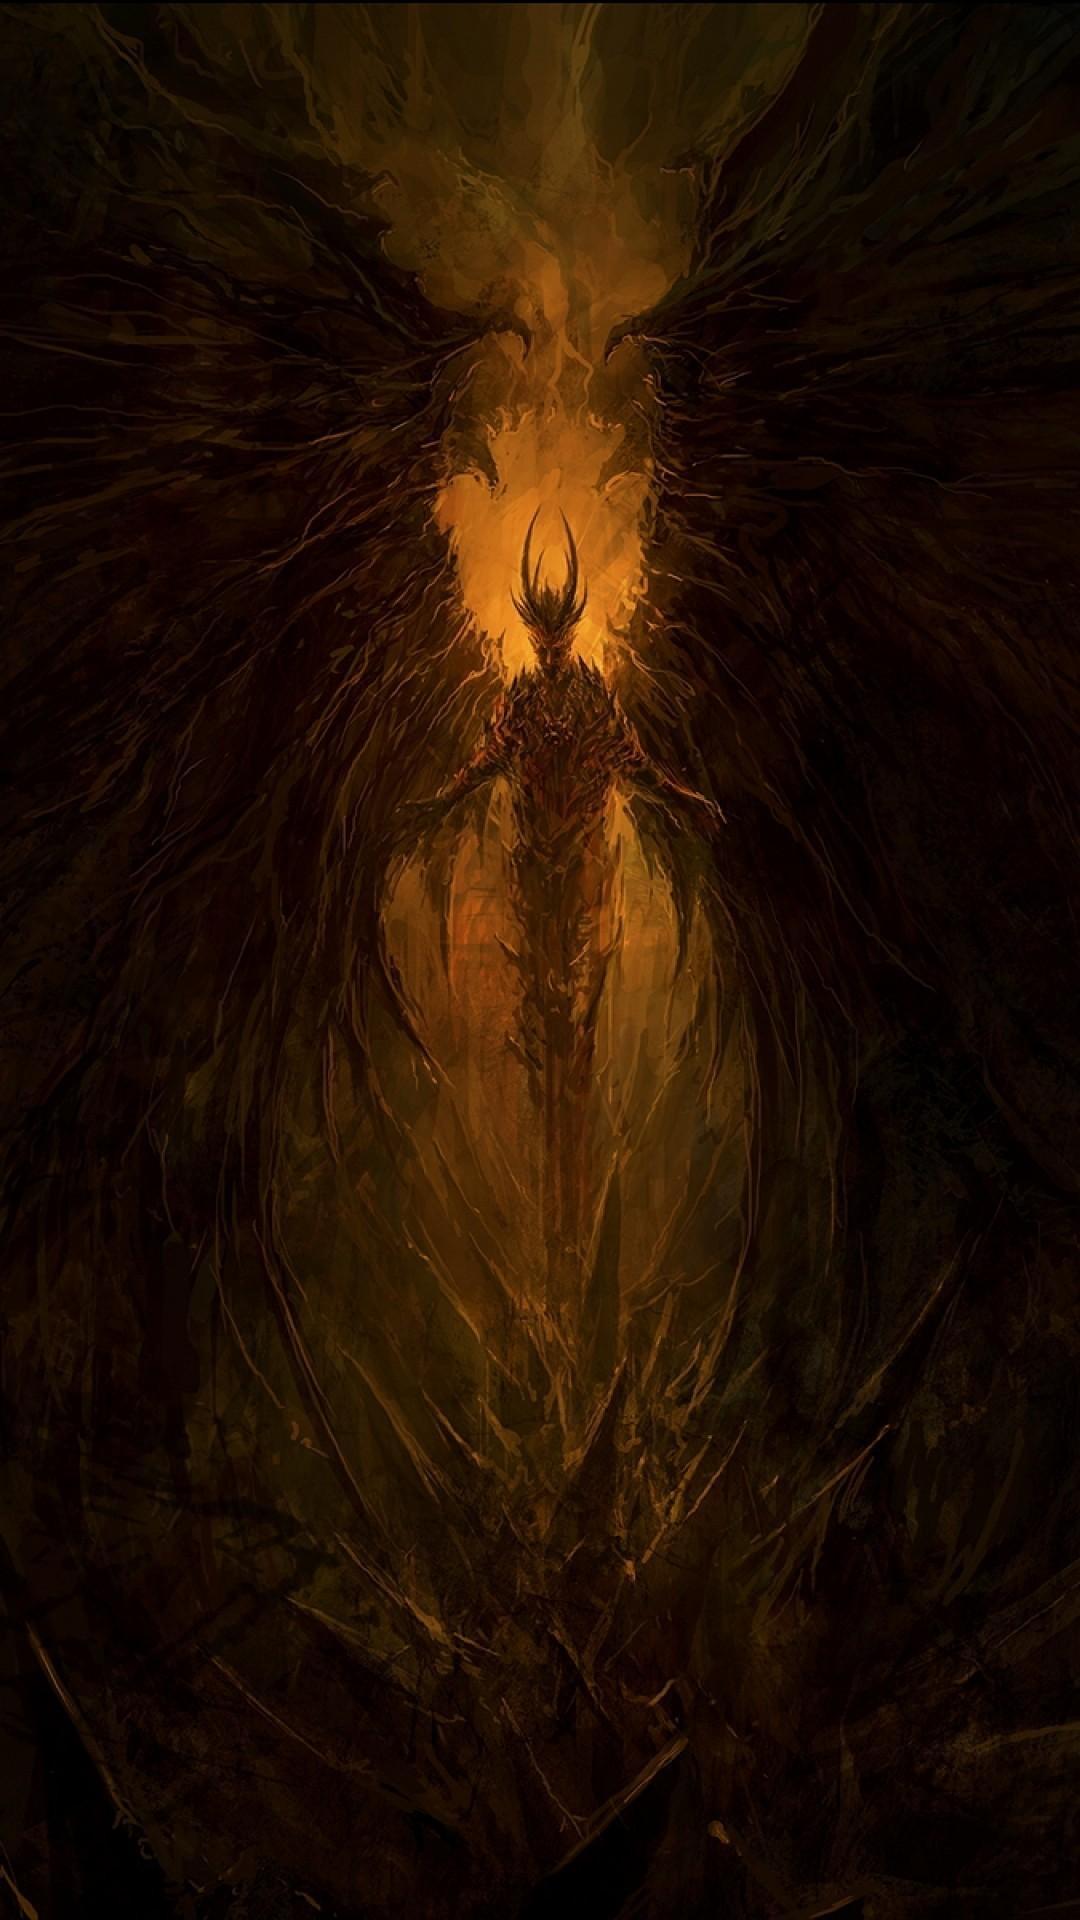 Download Satanic Wallpaper Hd Backgrounds Download Itlcat